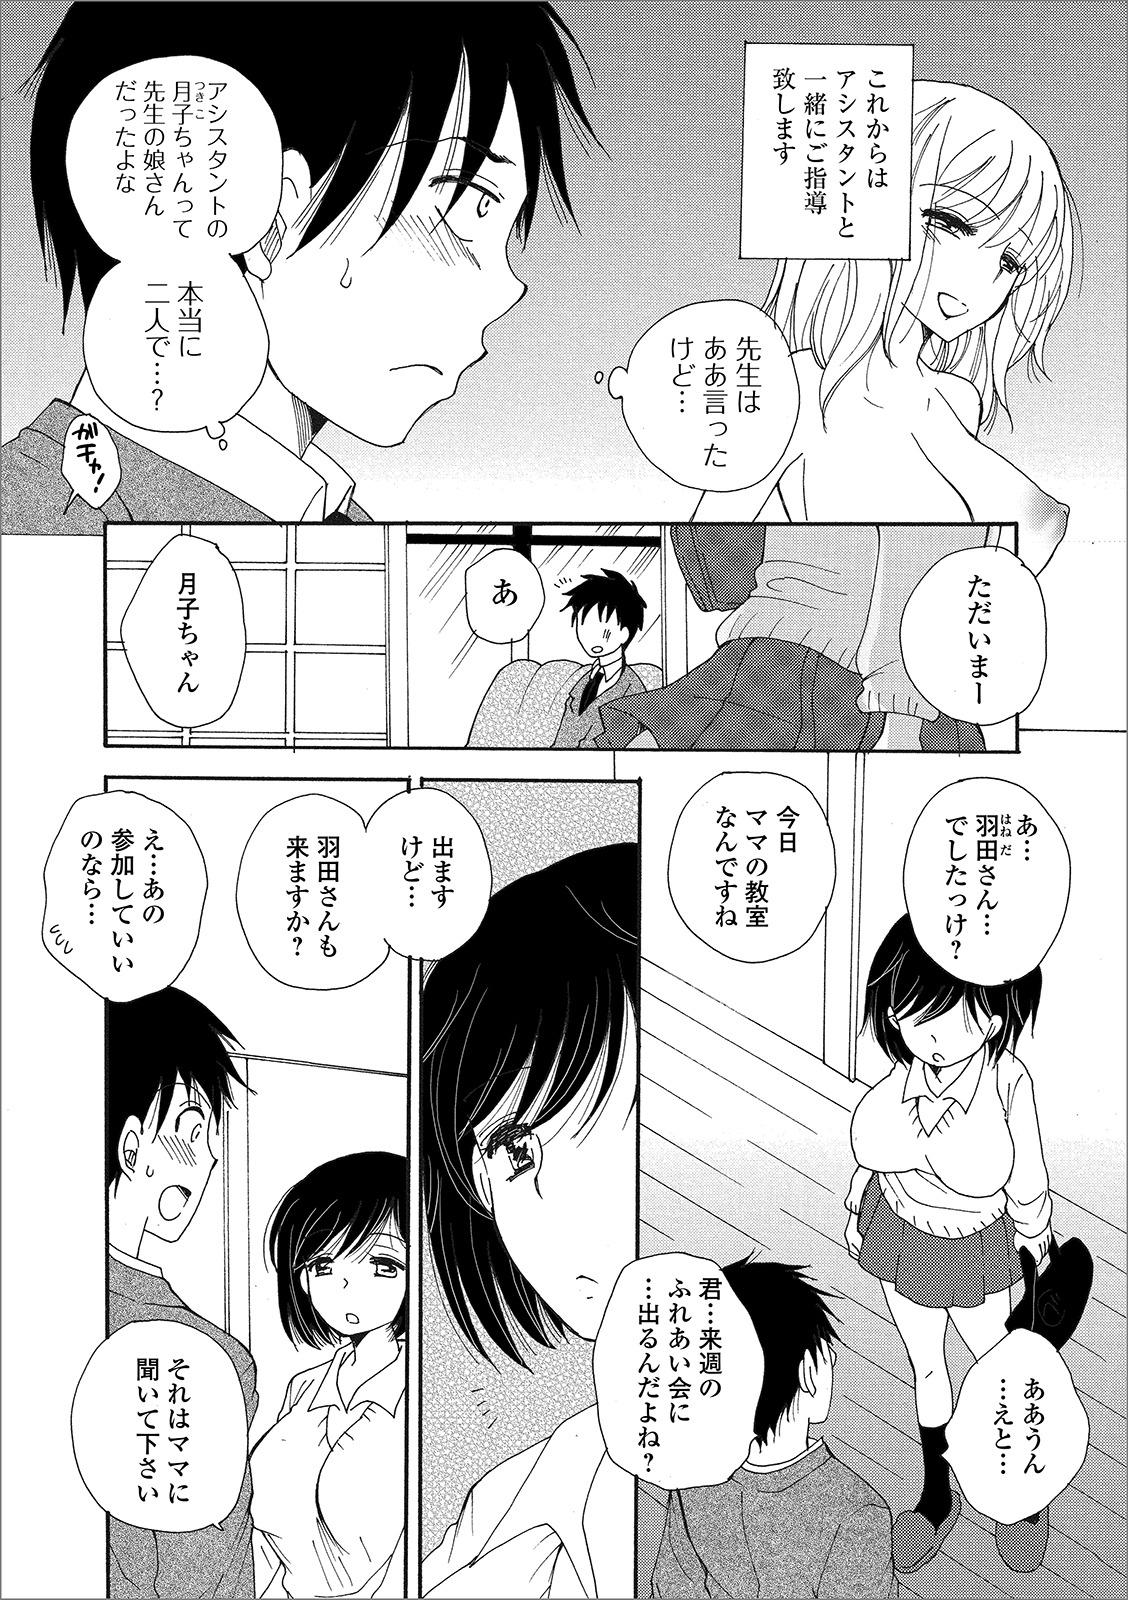 COMIC Shigekiteki SQUIRT!! Vol. 15 189